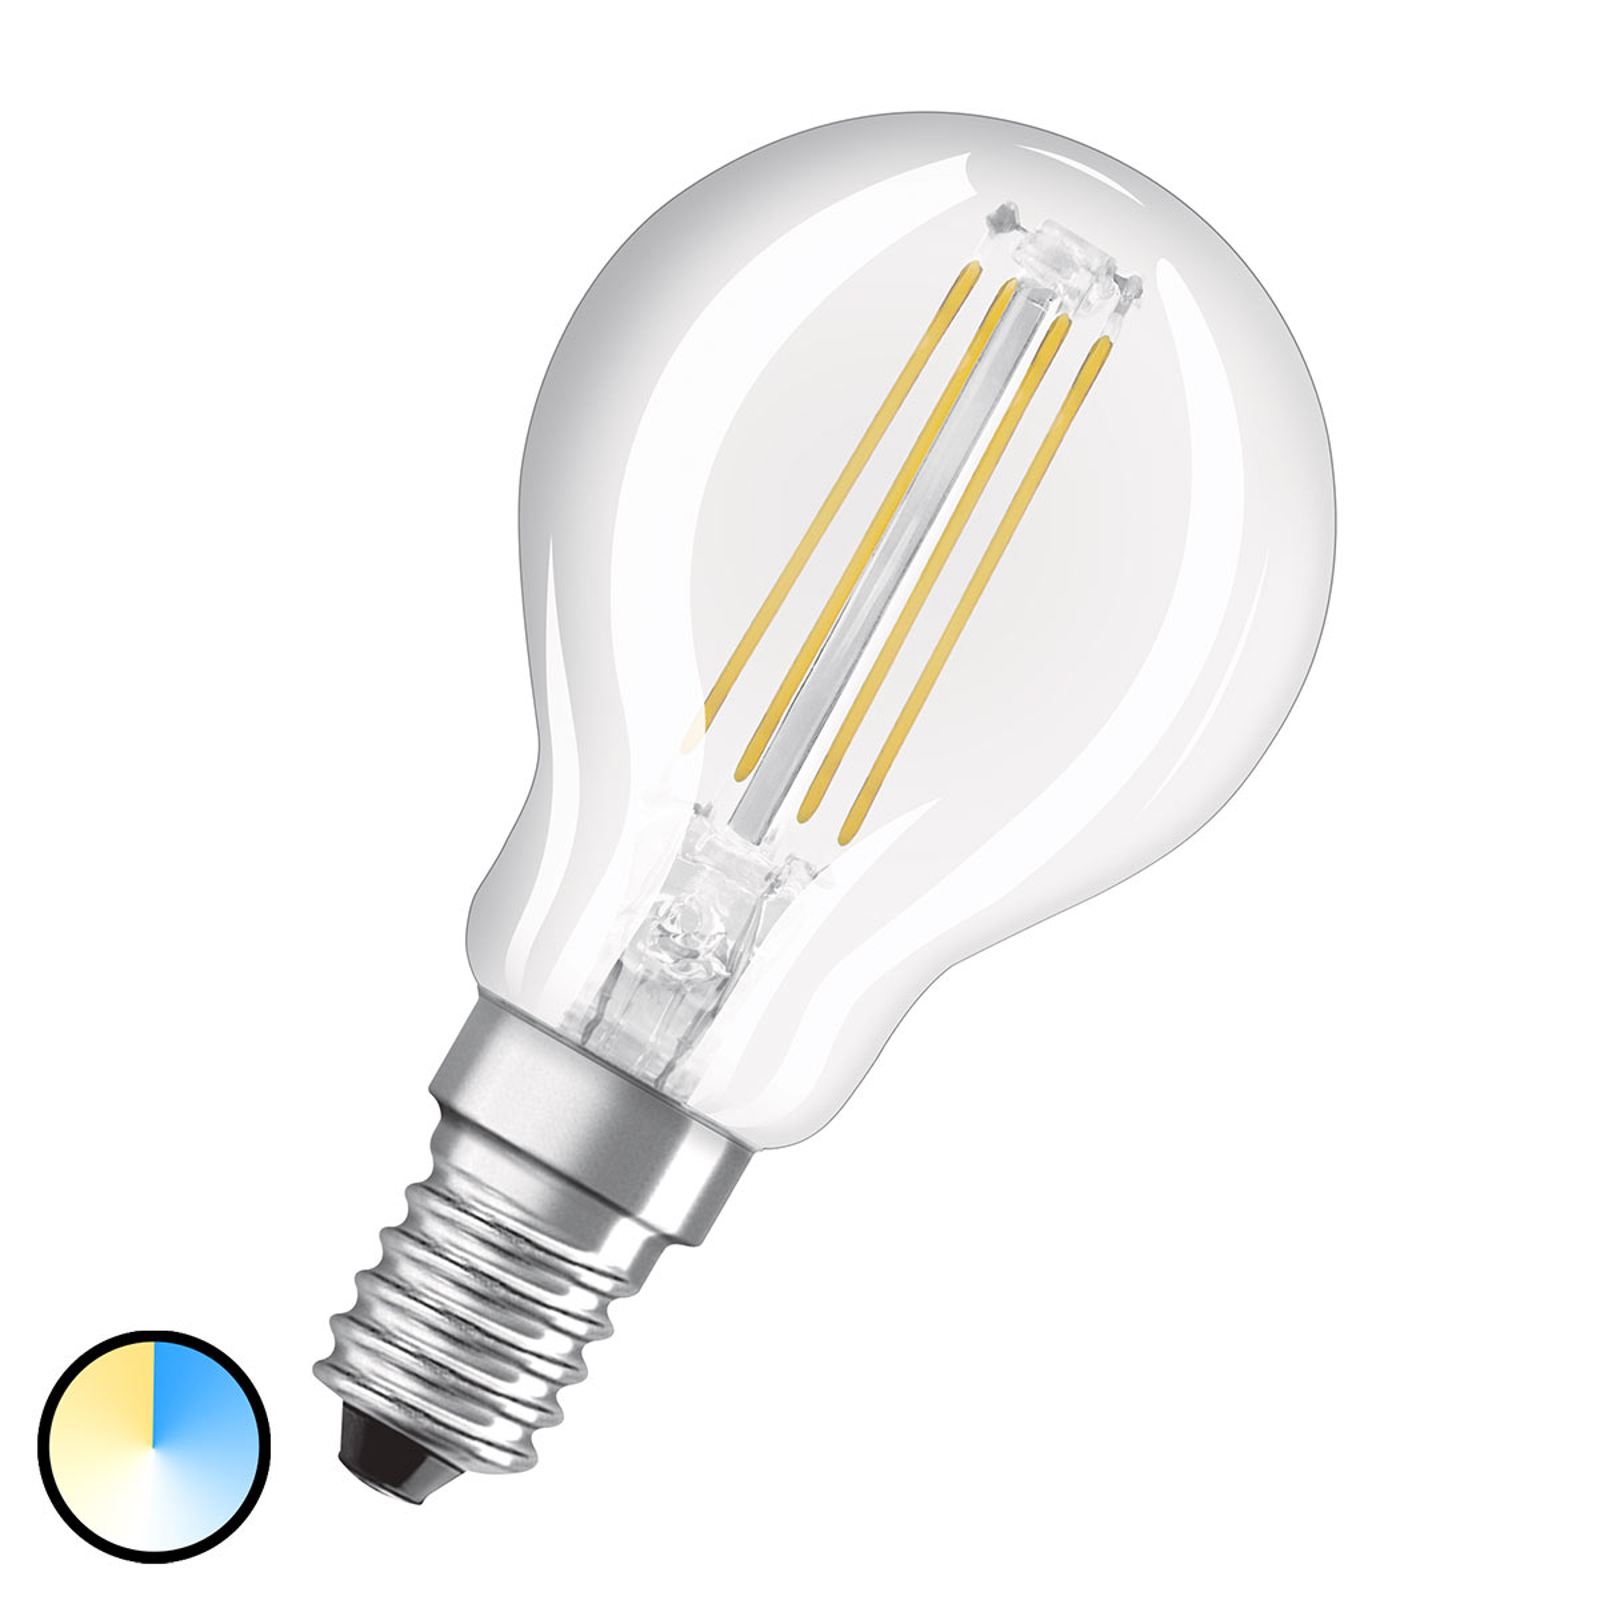 OSRAM LED-Lampe CLP E14 4W Star+ Relax&Active klar